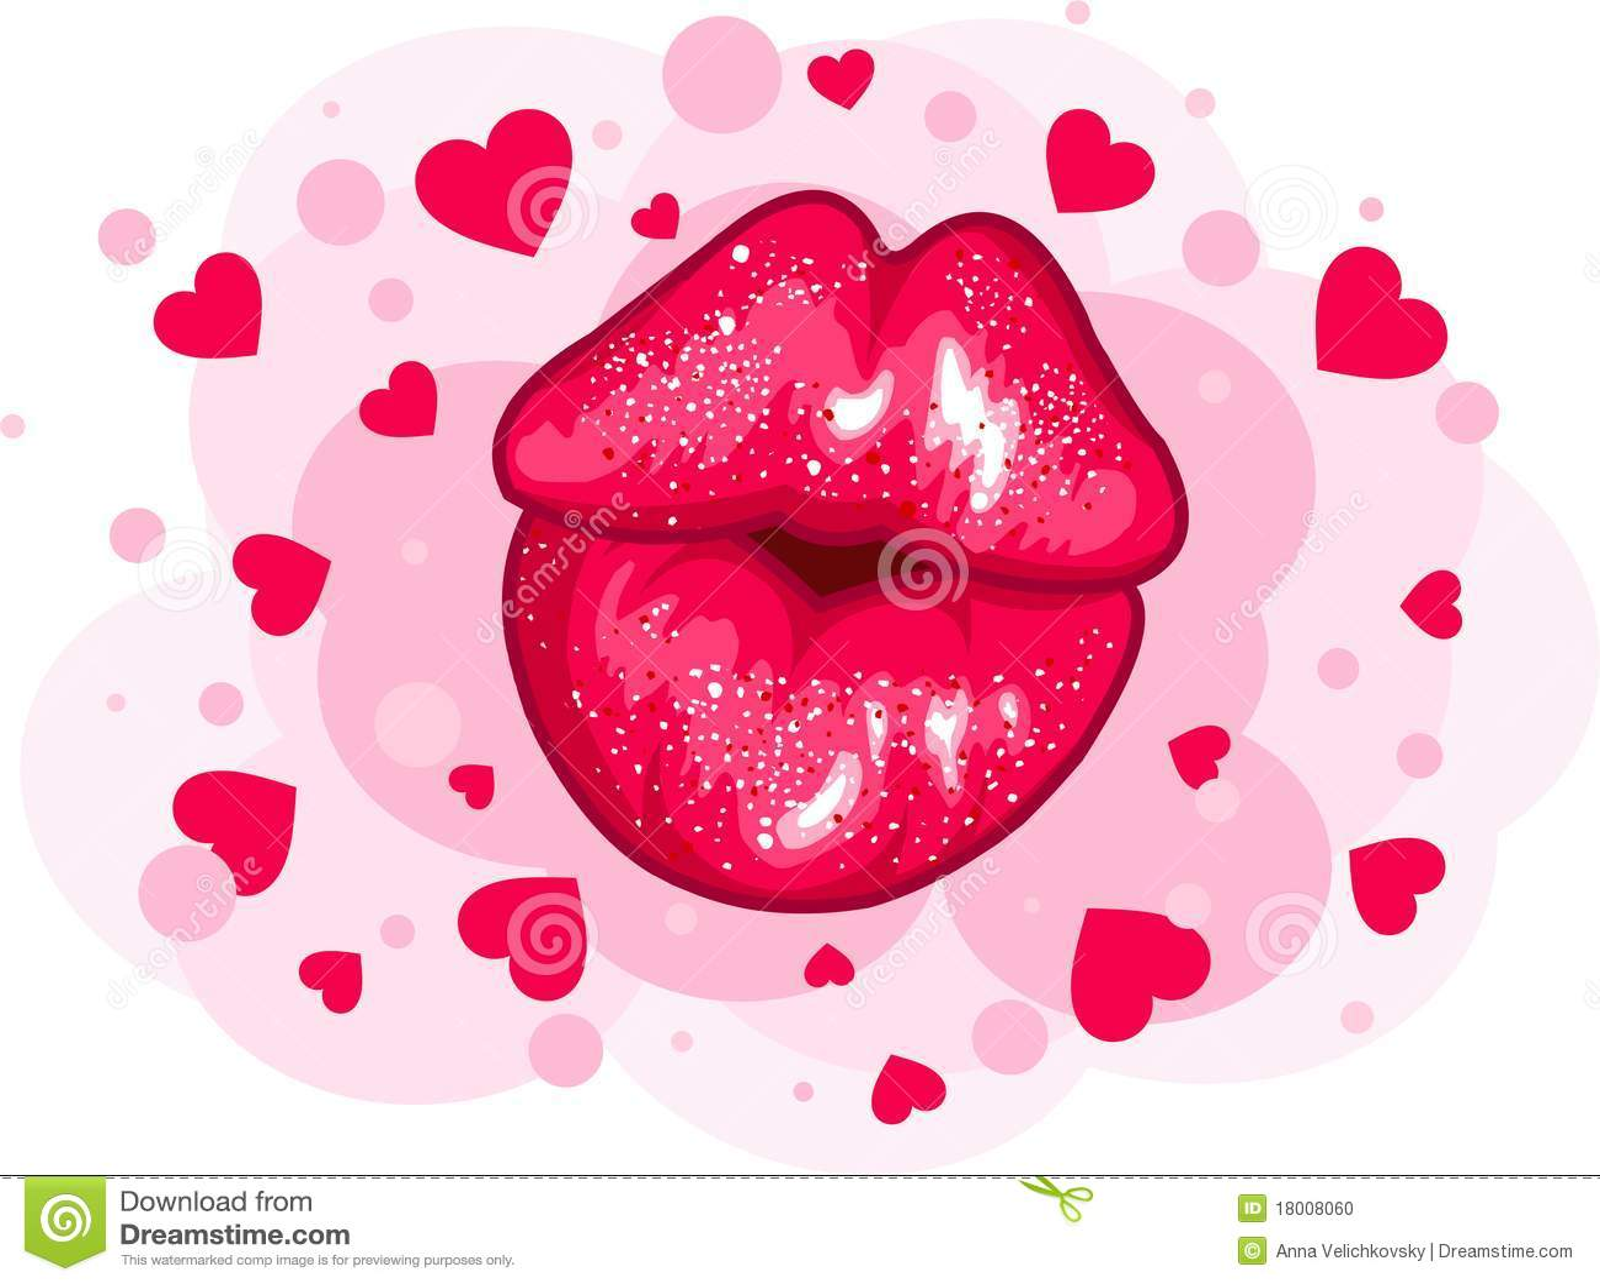 love kiss design stock photo image 18008060 love birds clipart svd love birds clip art image